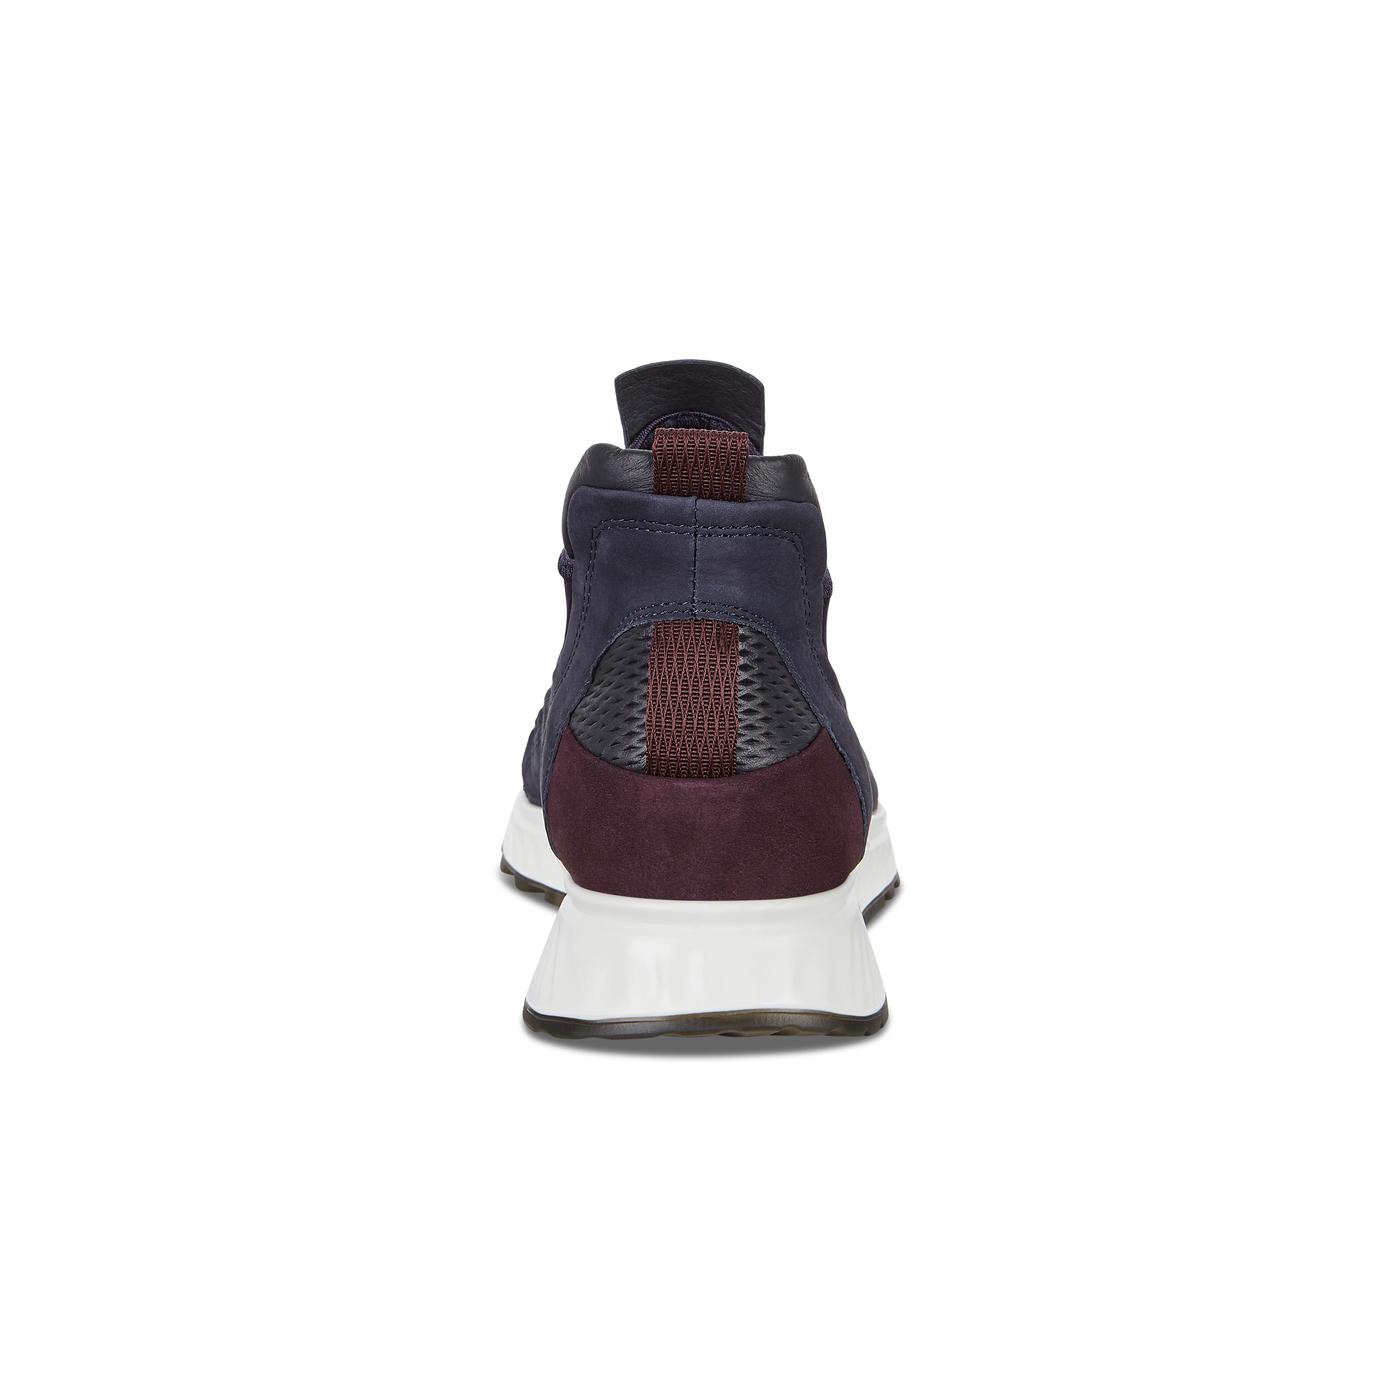 ECCO ST.1 Mens Mid Cut Sneaker Slip-On